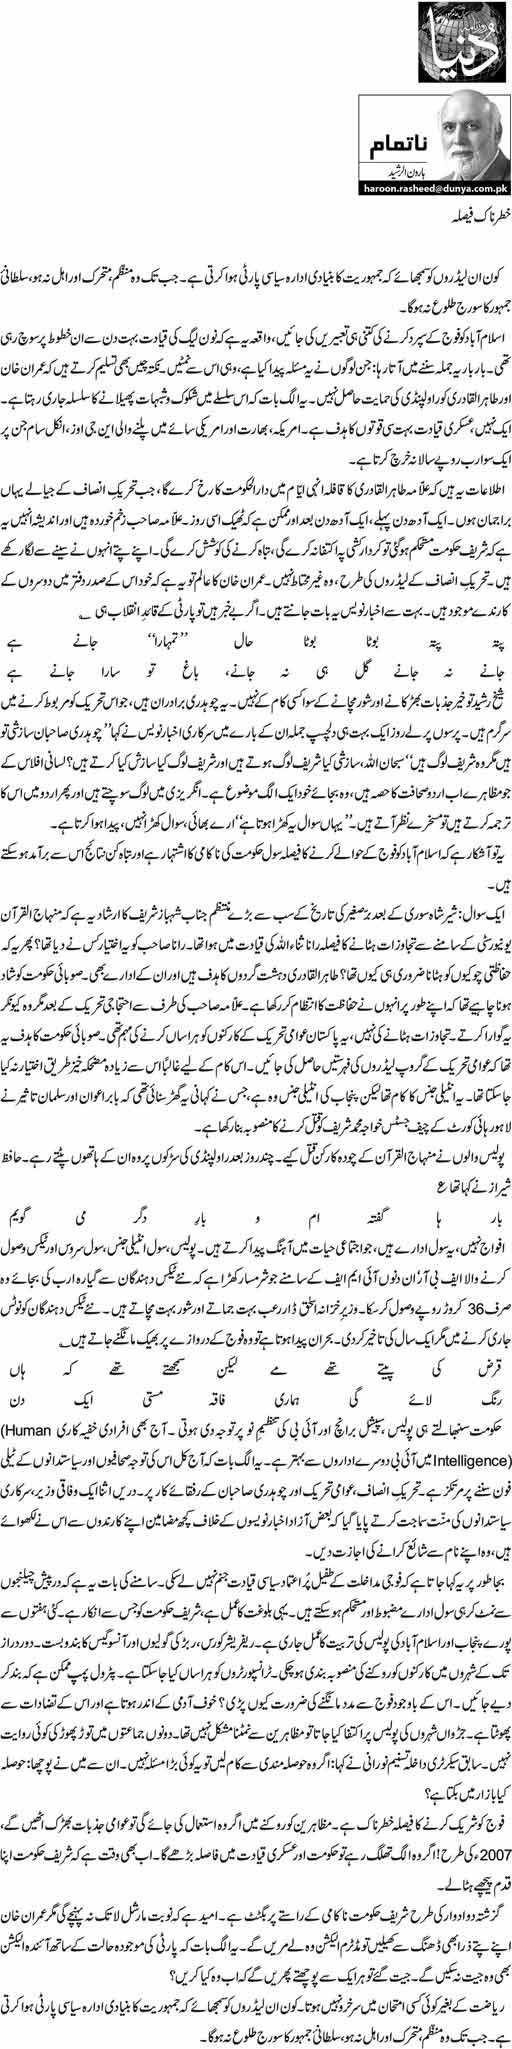 Print Media Coverage Daily Dunya - Haroon ur Rasheed